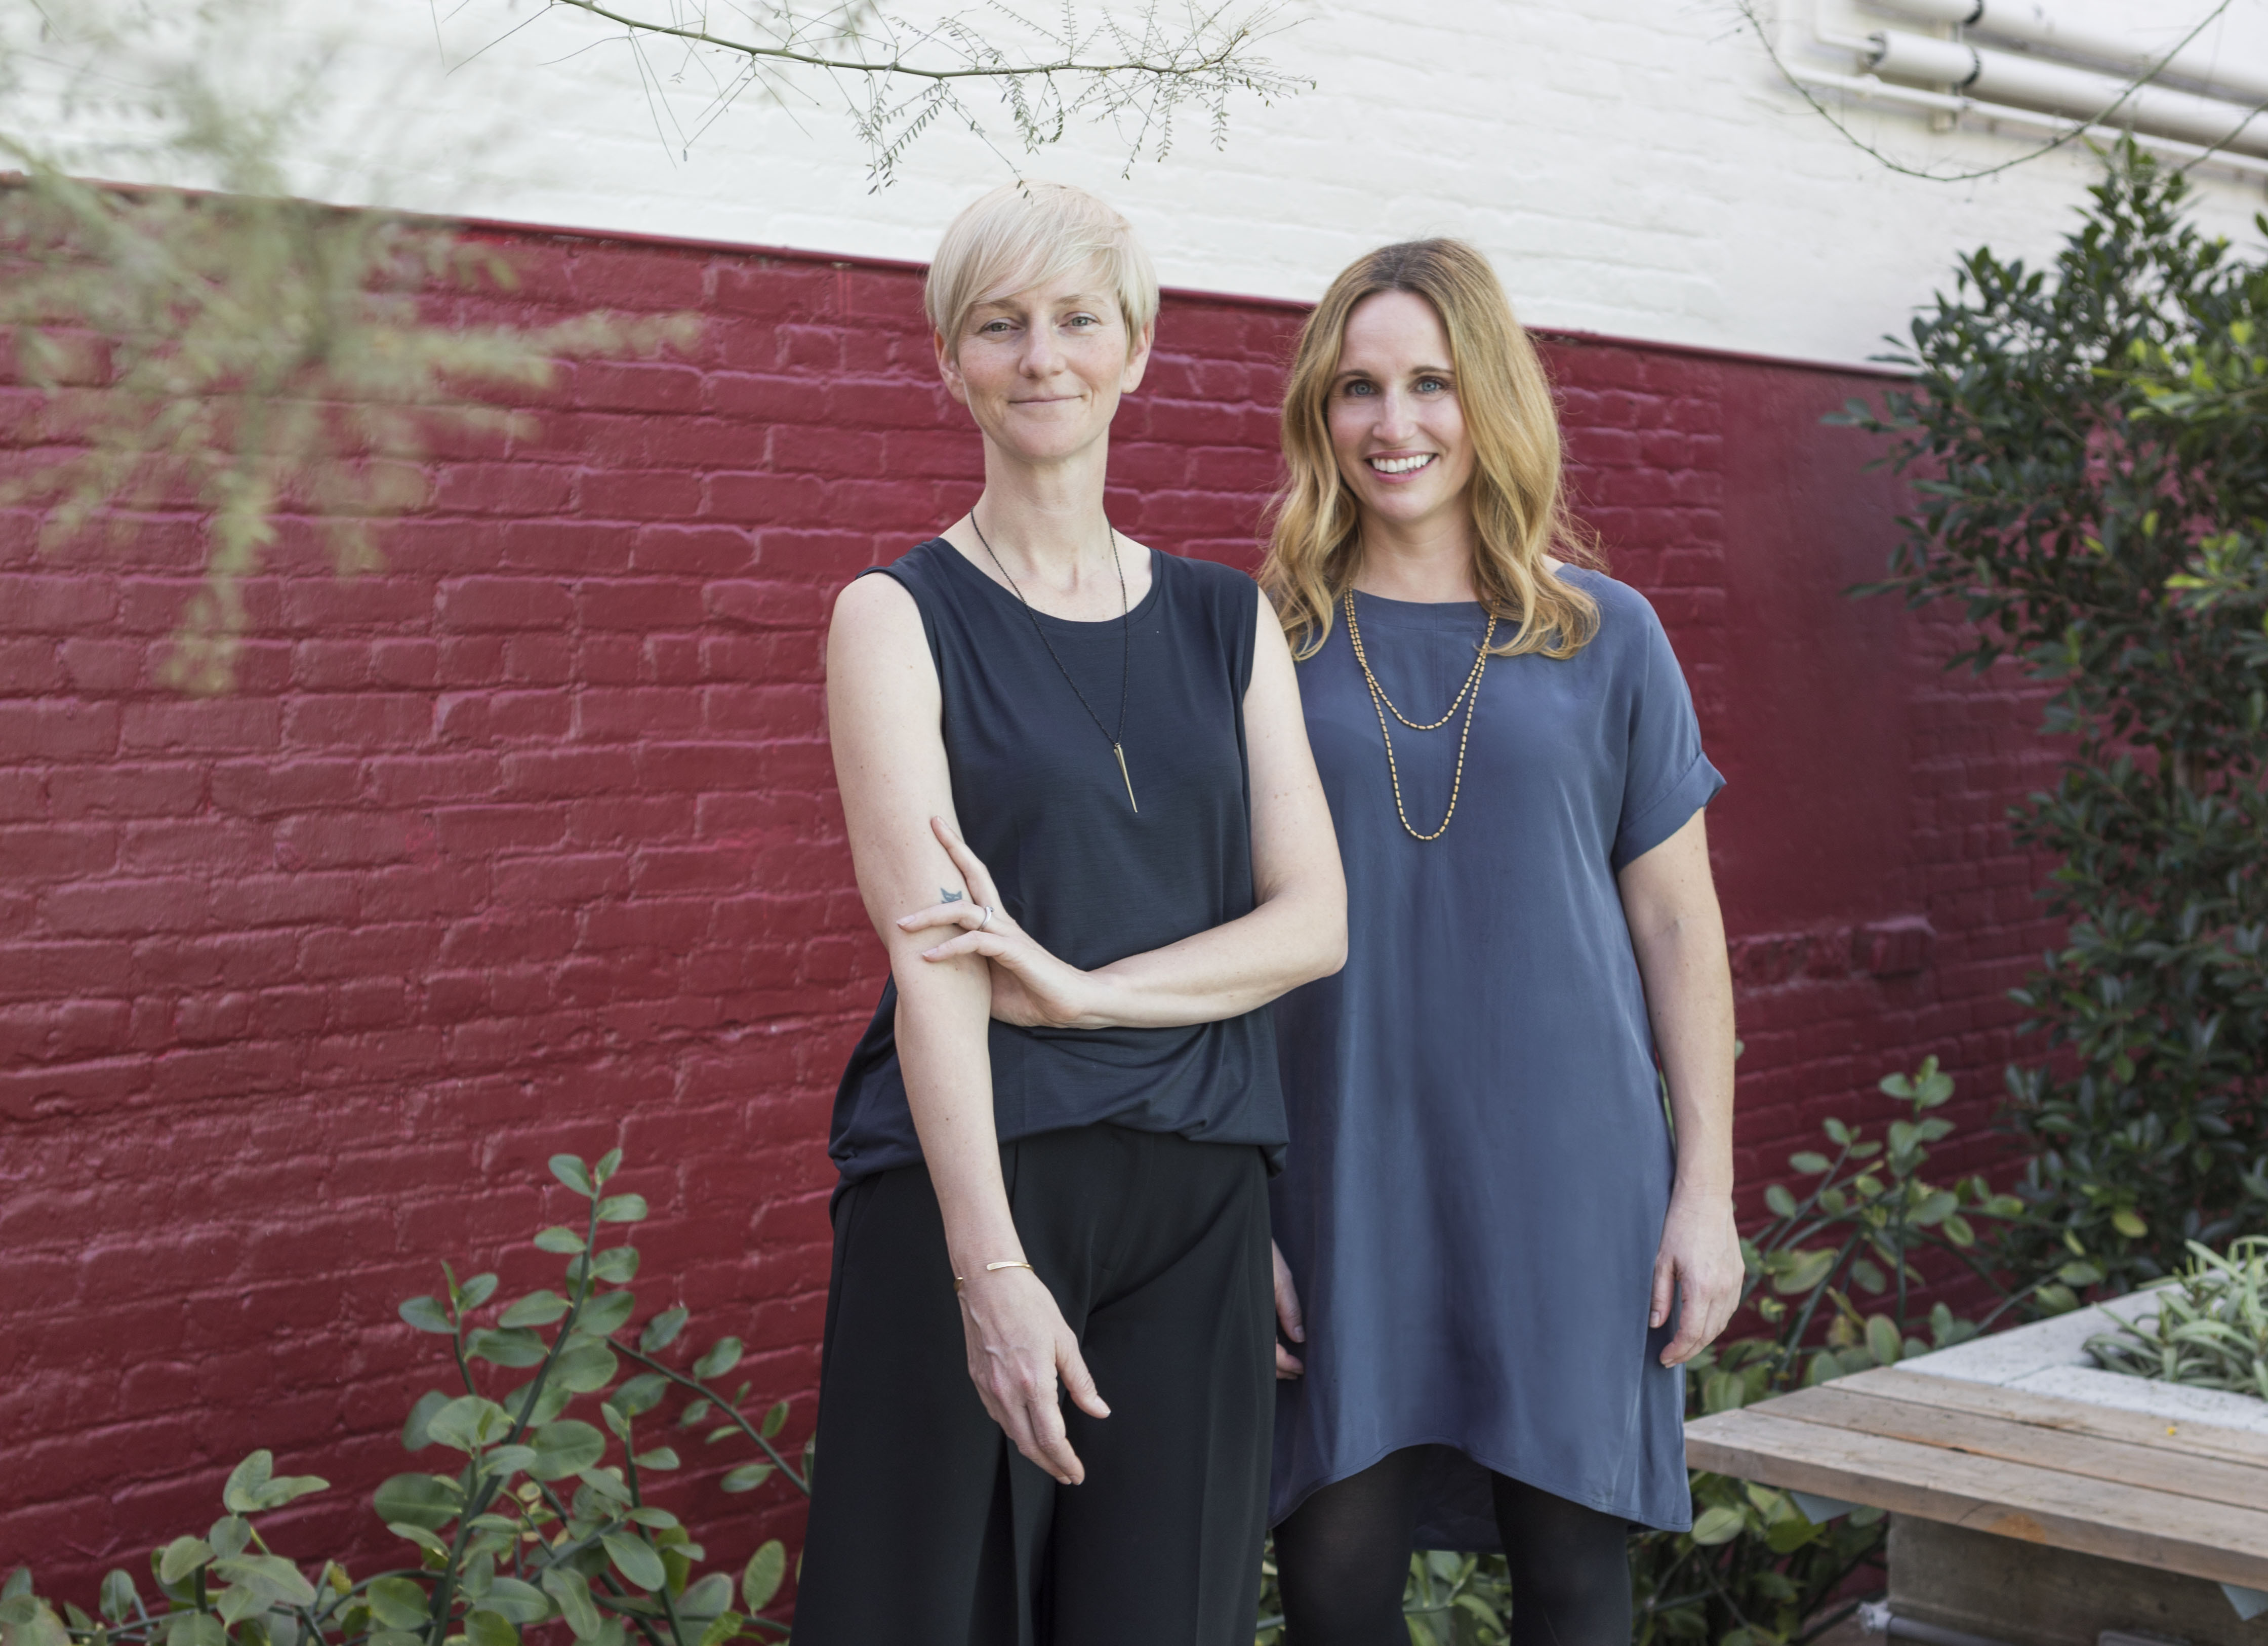 Catherine Johnson and Rebecca Rudolph portraits